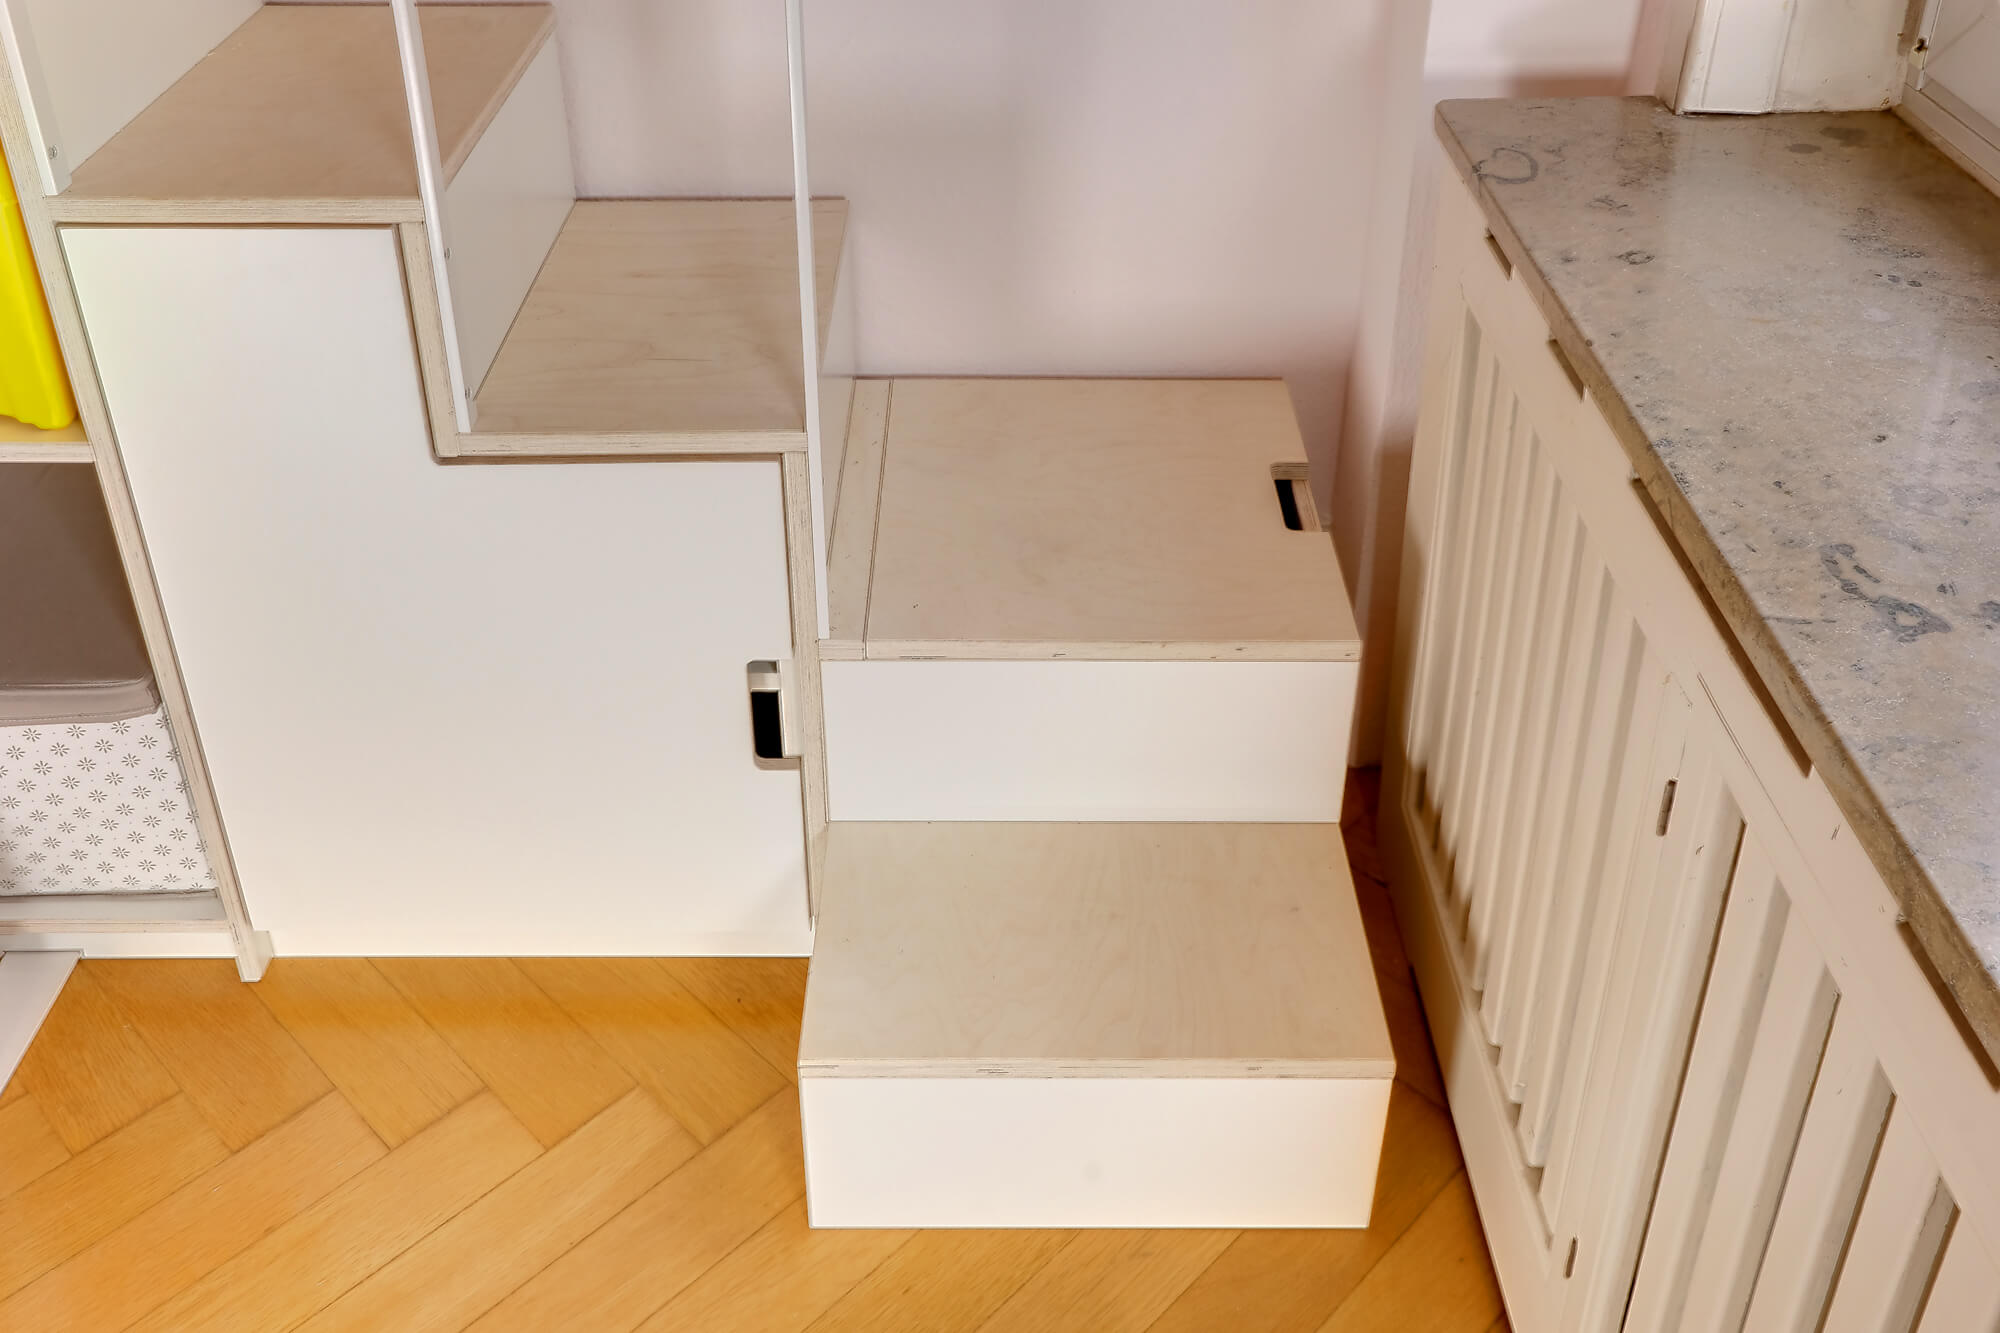 Treppen-Podest mit geschlossenem Stauraum.